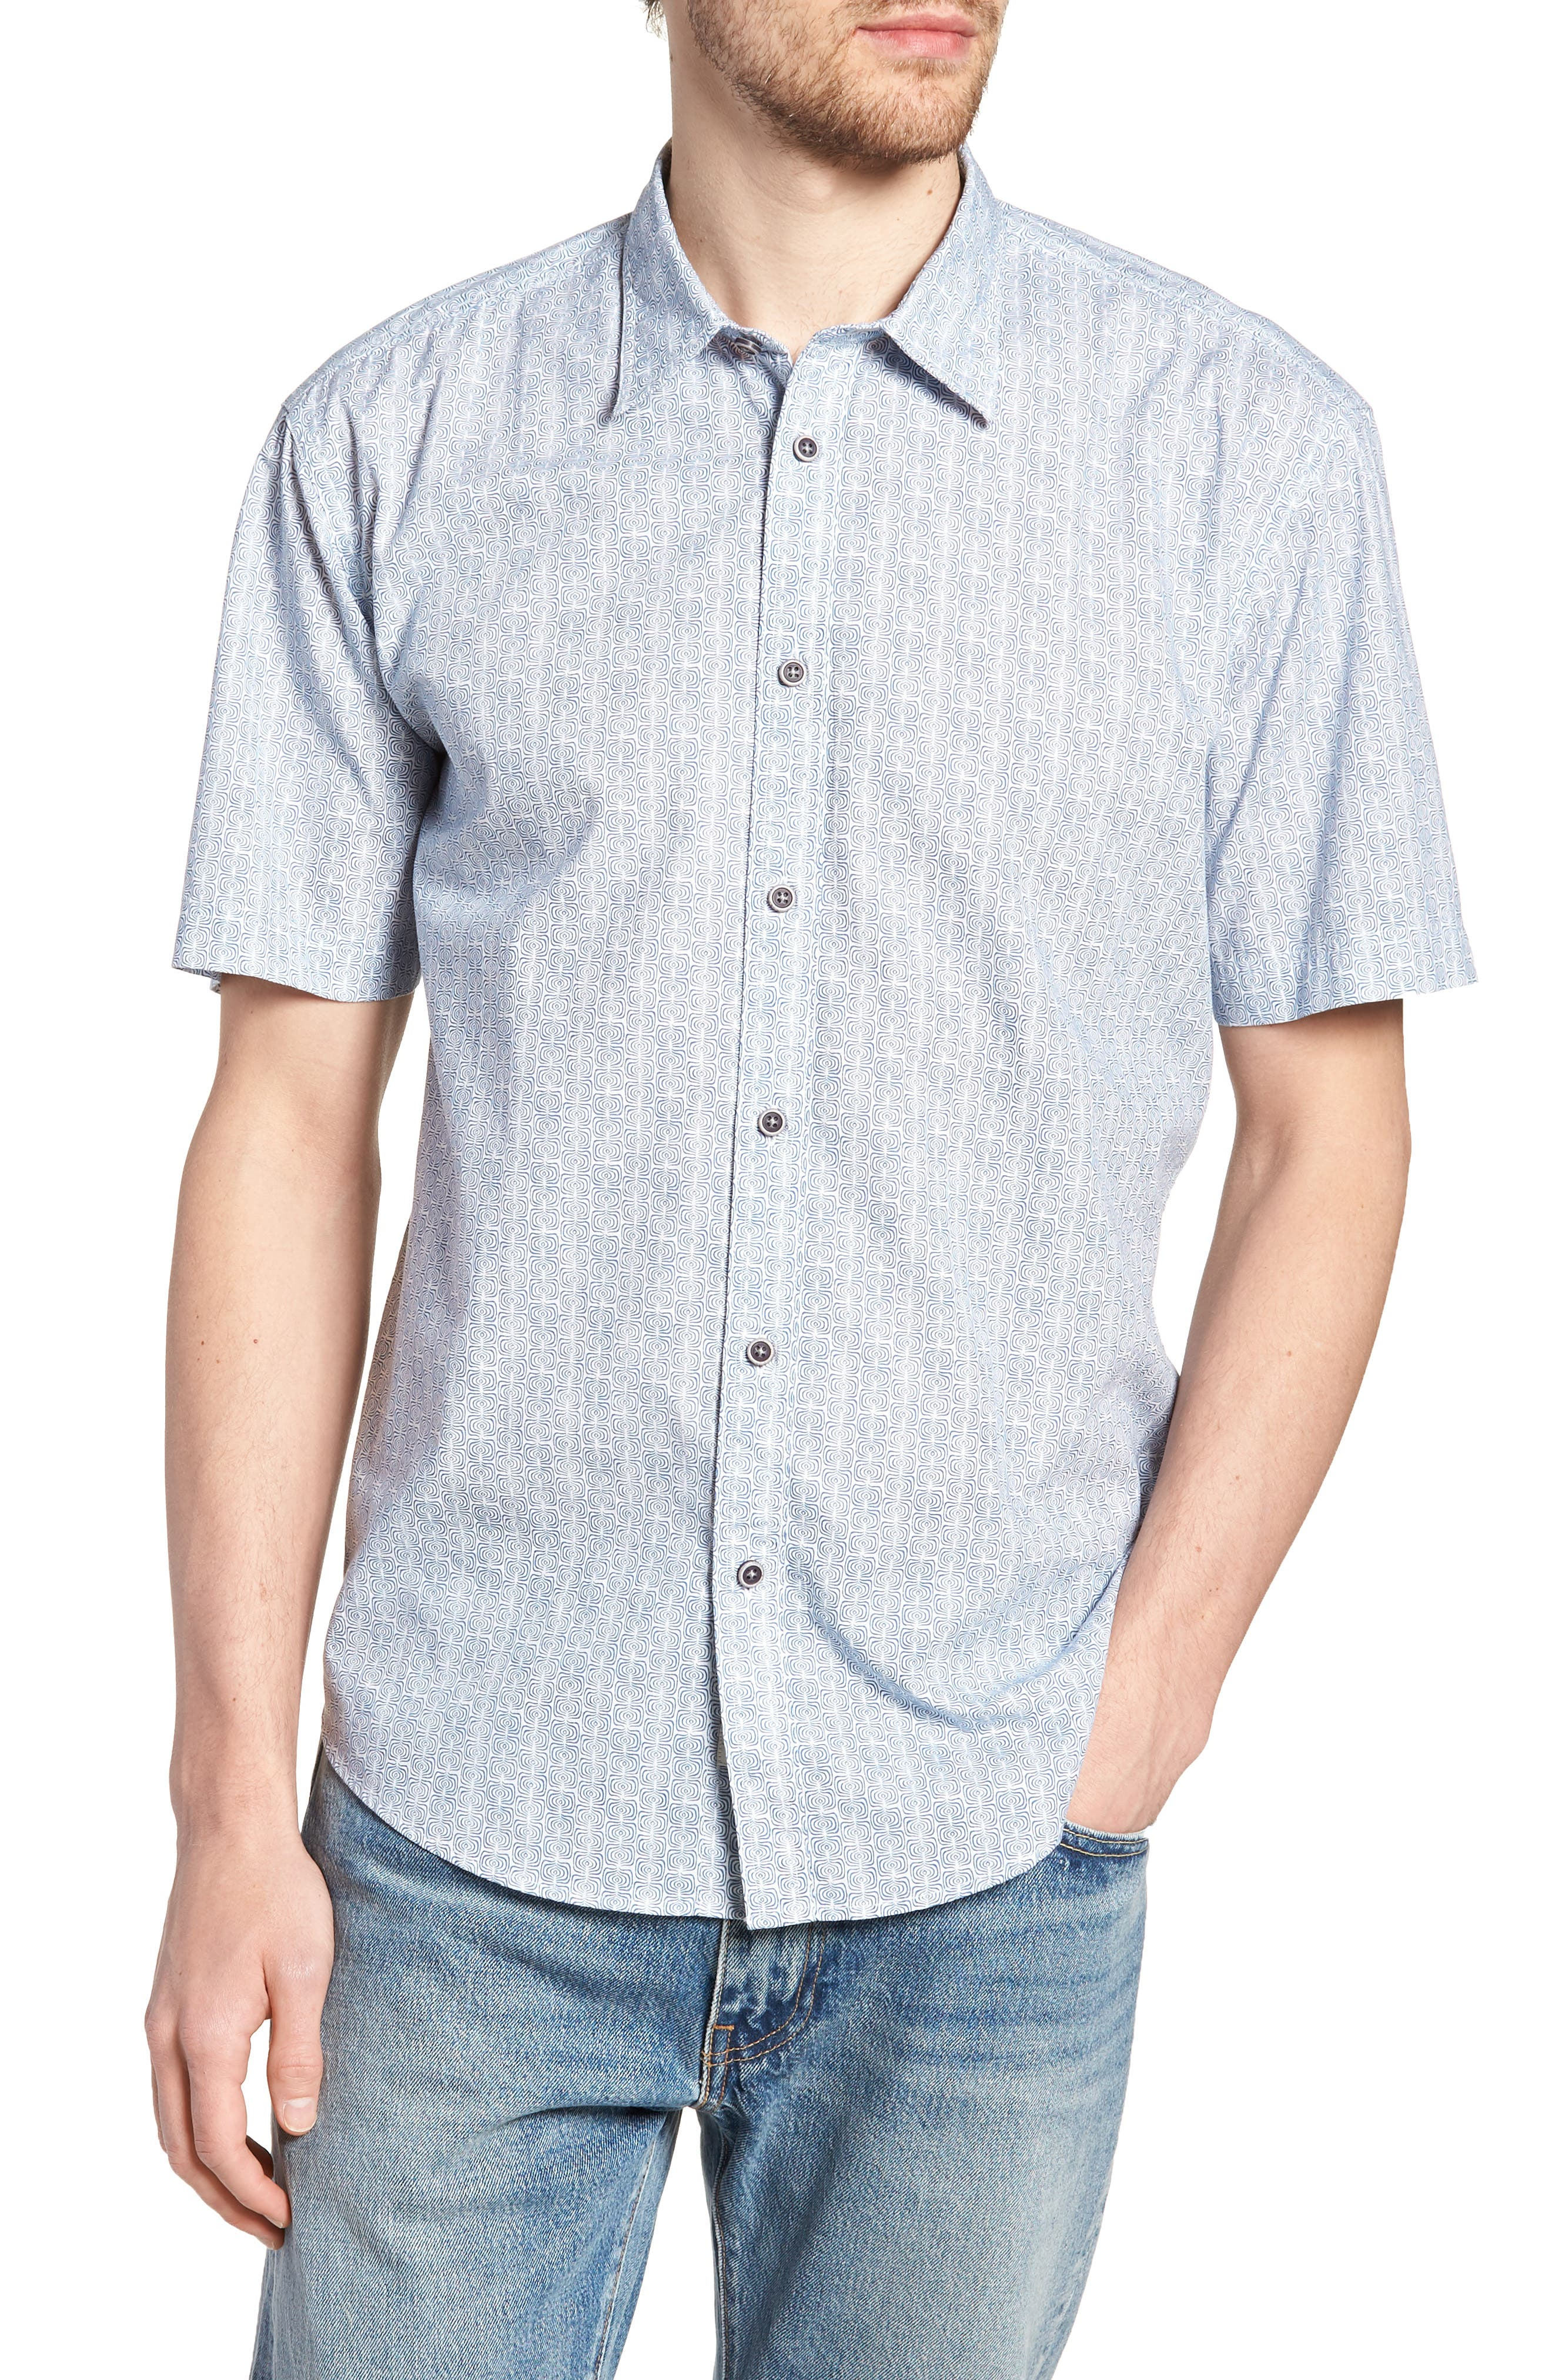 Jacurre Regular Fit Short Sleeve Sport Shirt,                             Main thumbnail 1, color,                             462